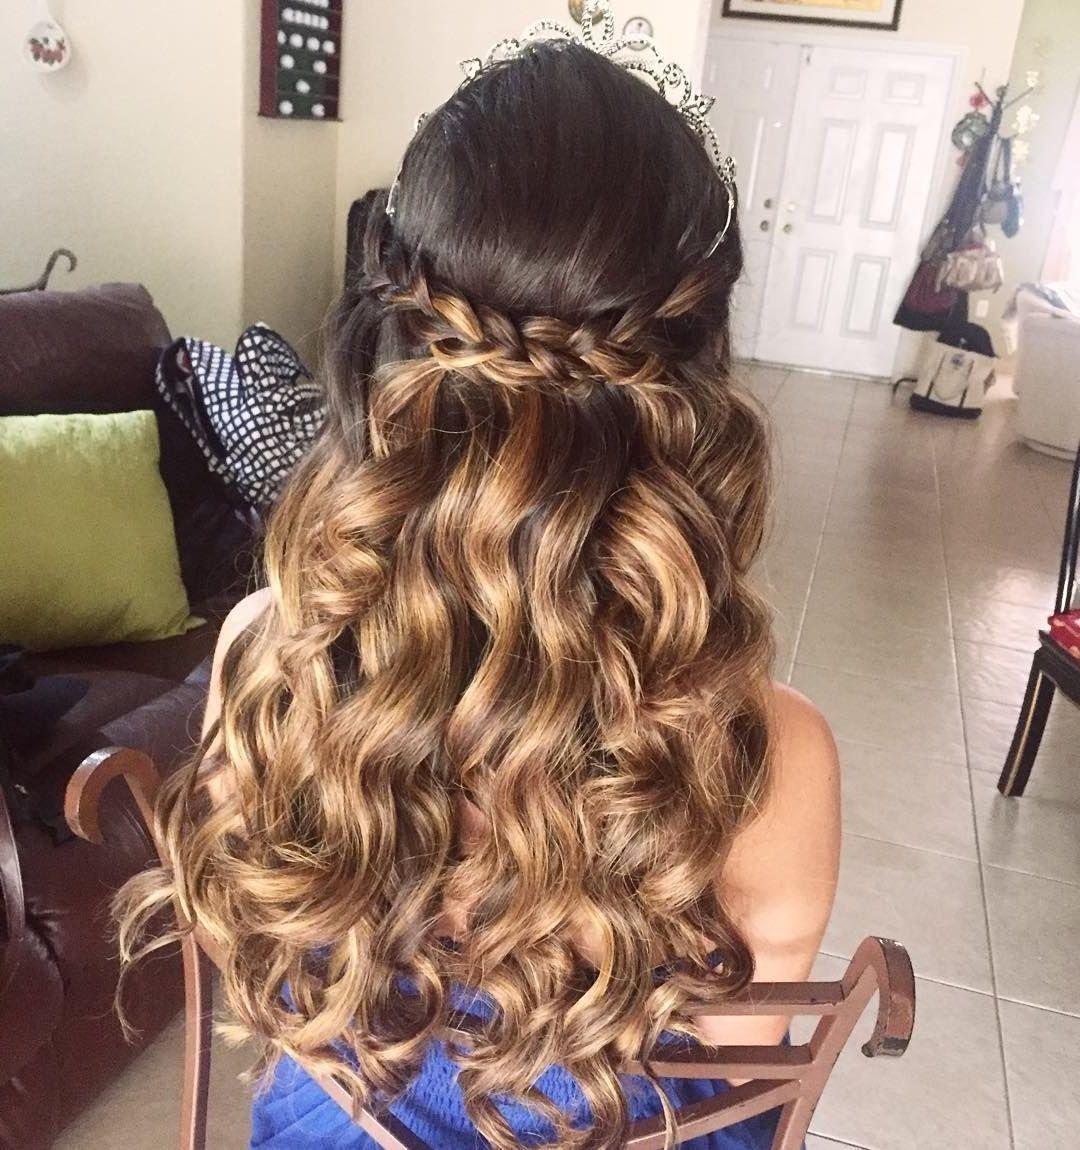 25 Amazing Quinceanera Hairstyles Ceplukan Quince Hairstyles Hair Styles Quinceanera Hairstyles